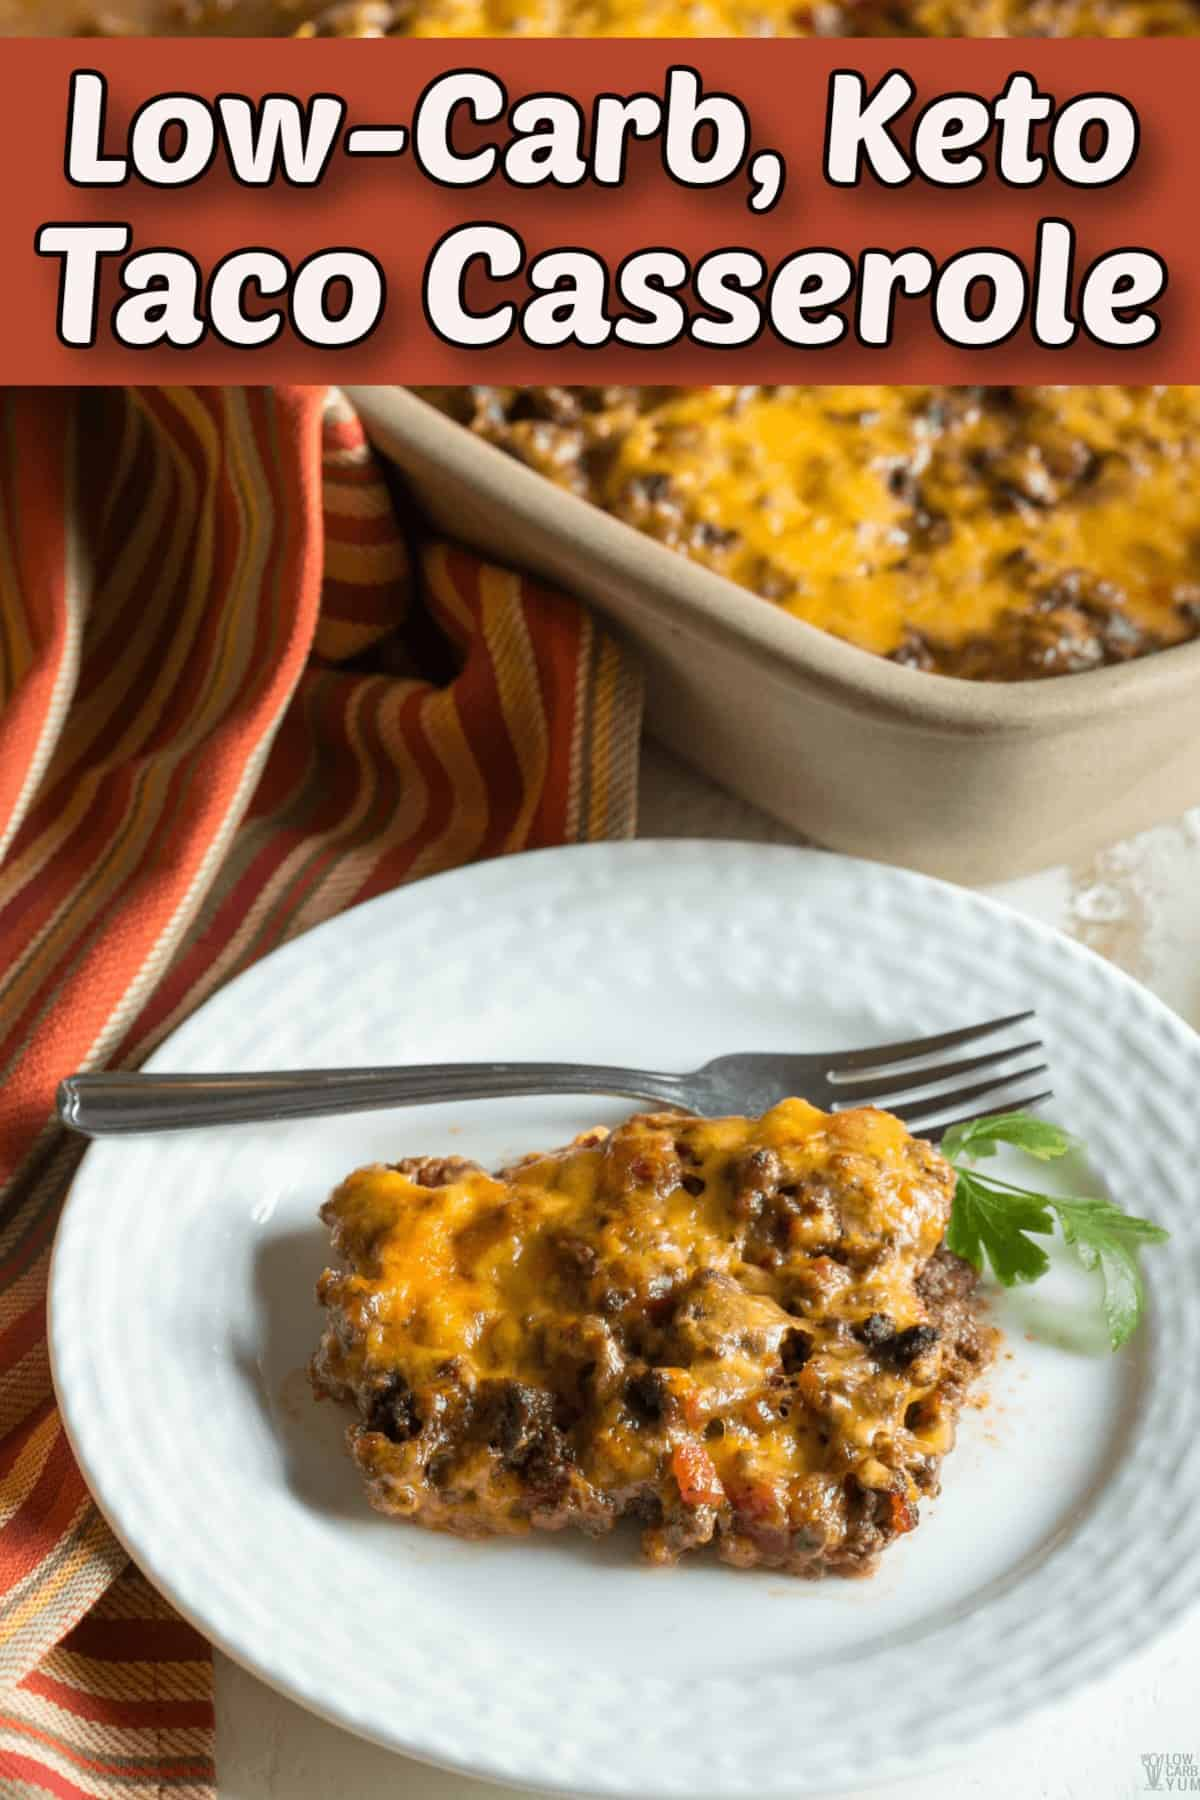 low carb keto taco casserole pintrest image